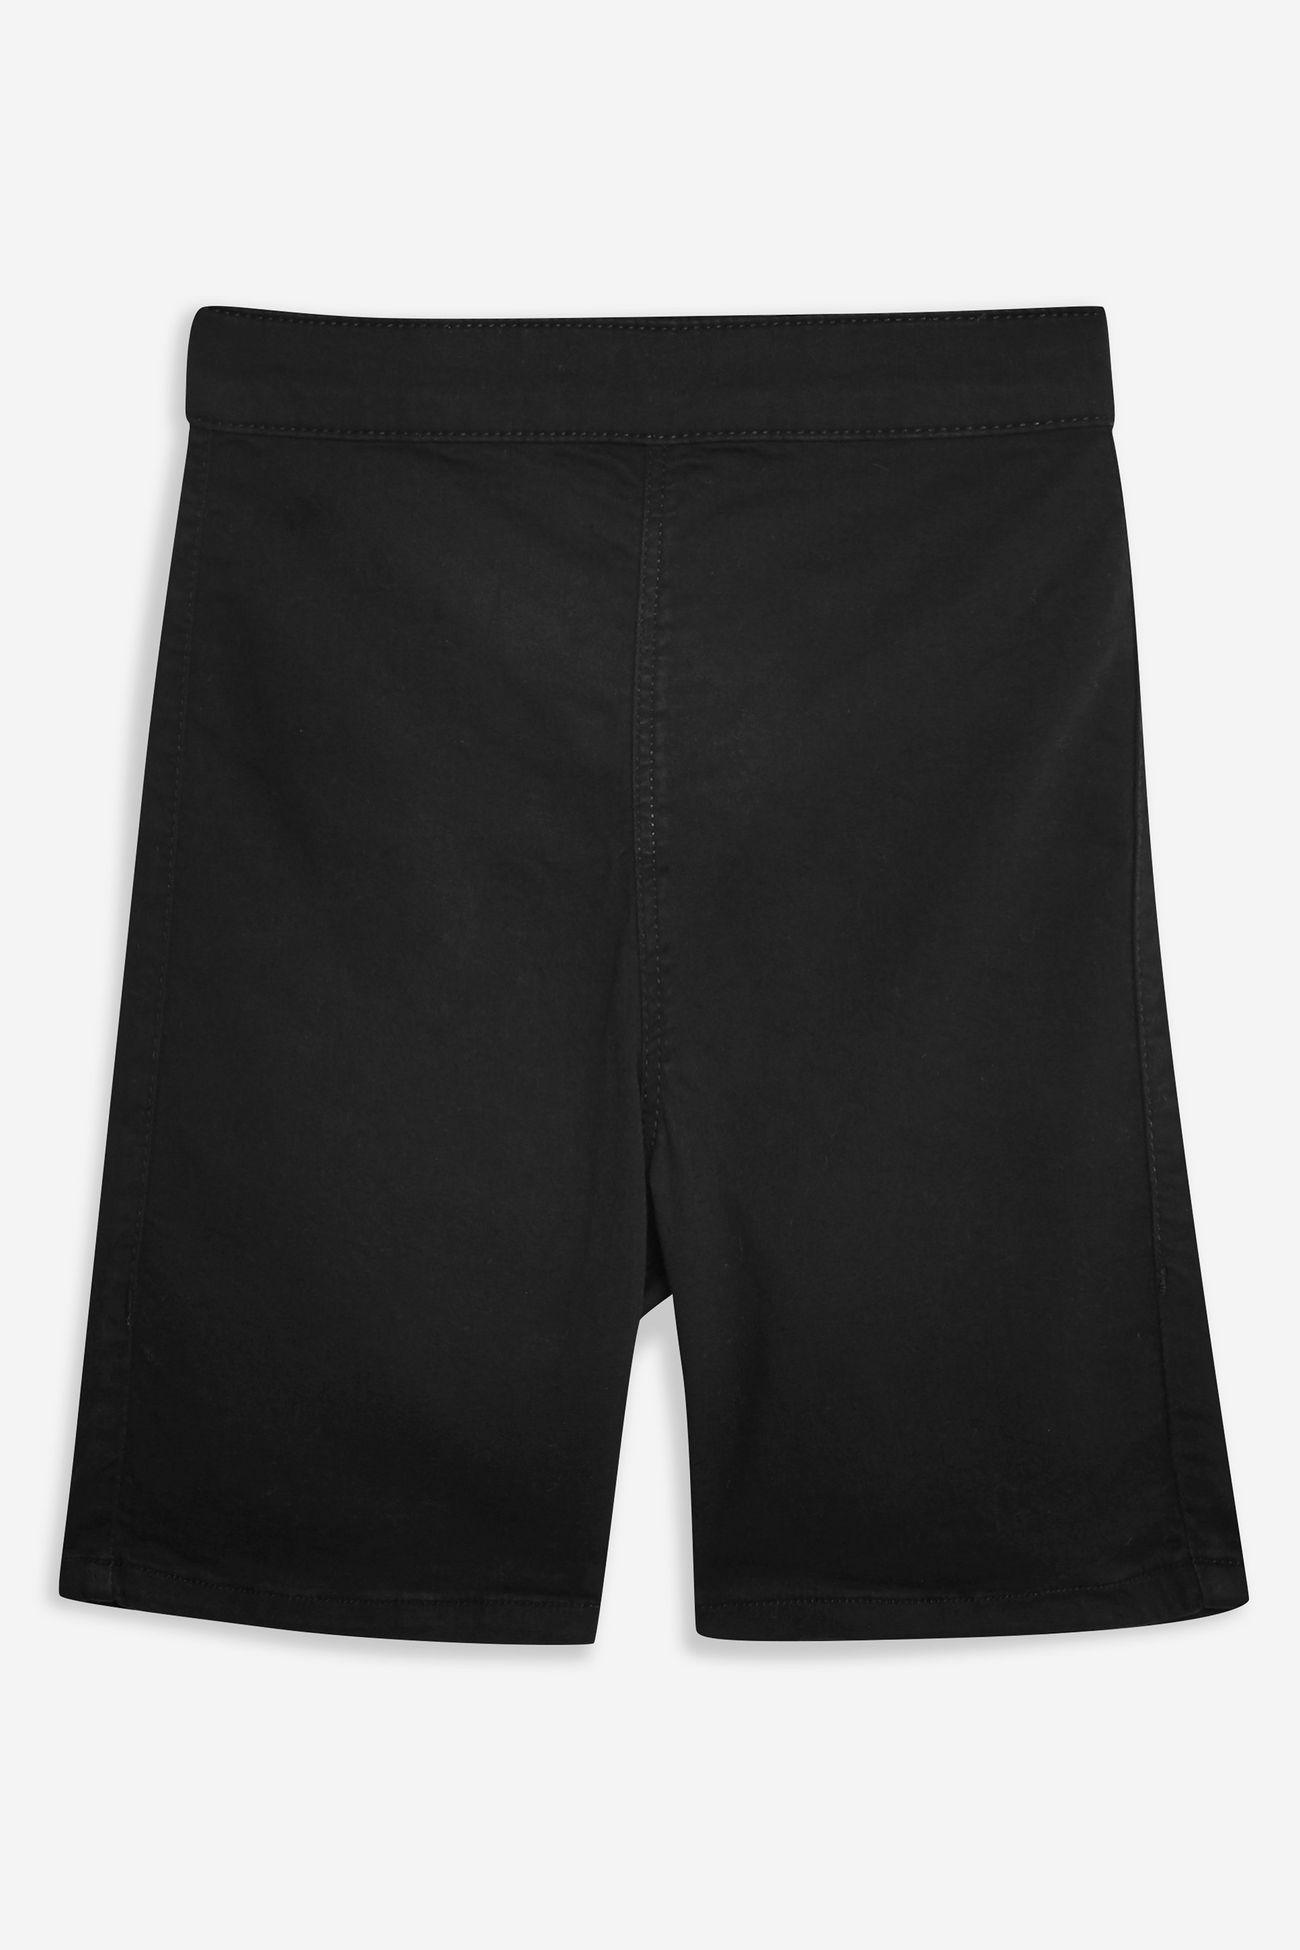 Joni Cycling Shorts With Zip Back